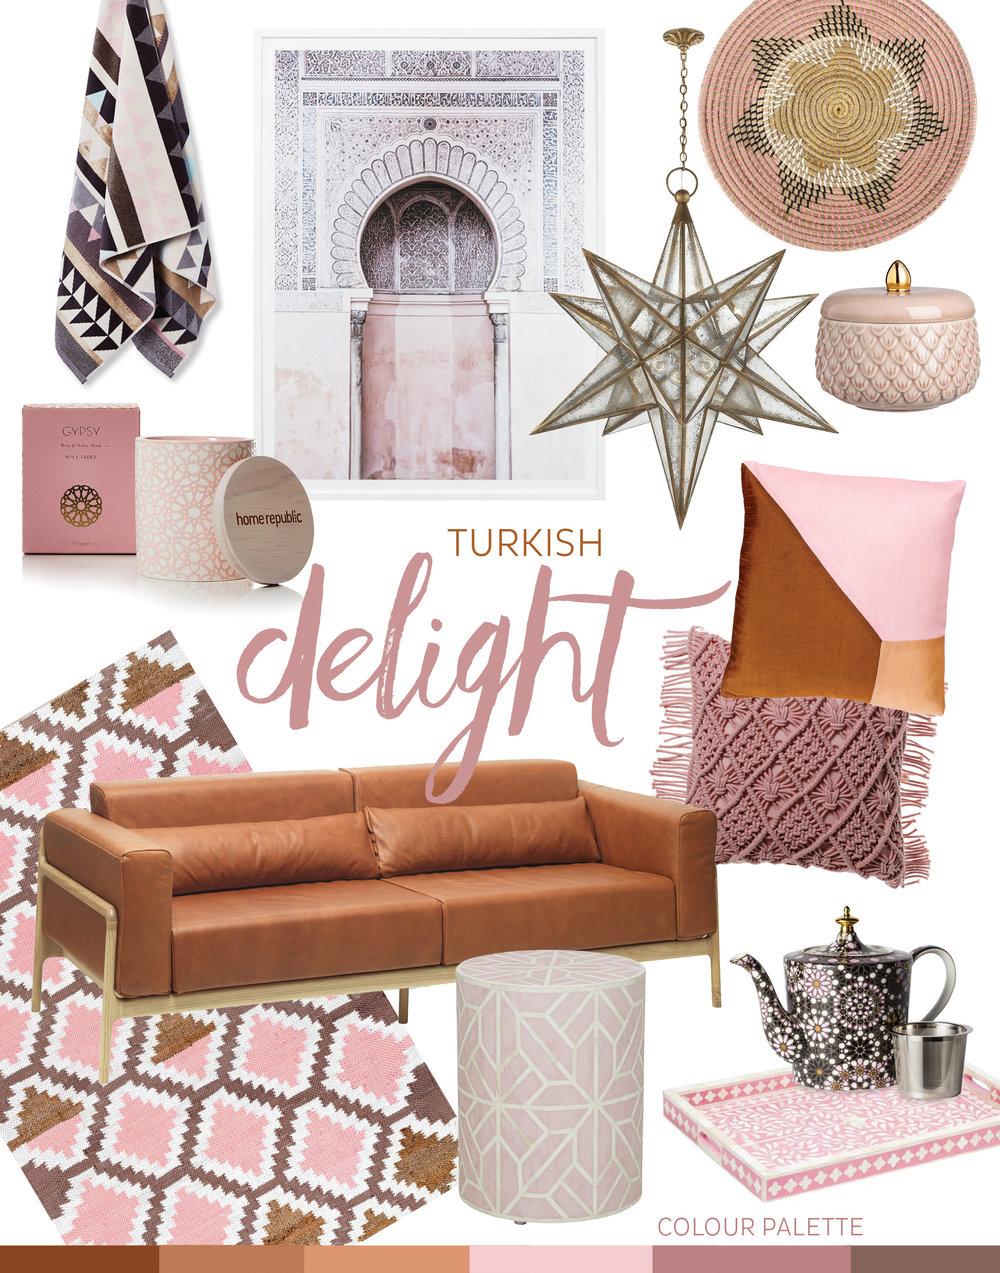 adore_home_blog_turkish_delight_trend_pink_dark_cognac_leather_moroccan_gypsy_bone_inlay.jpg